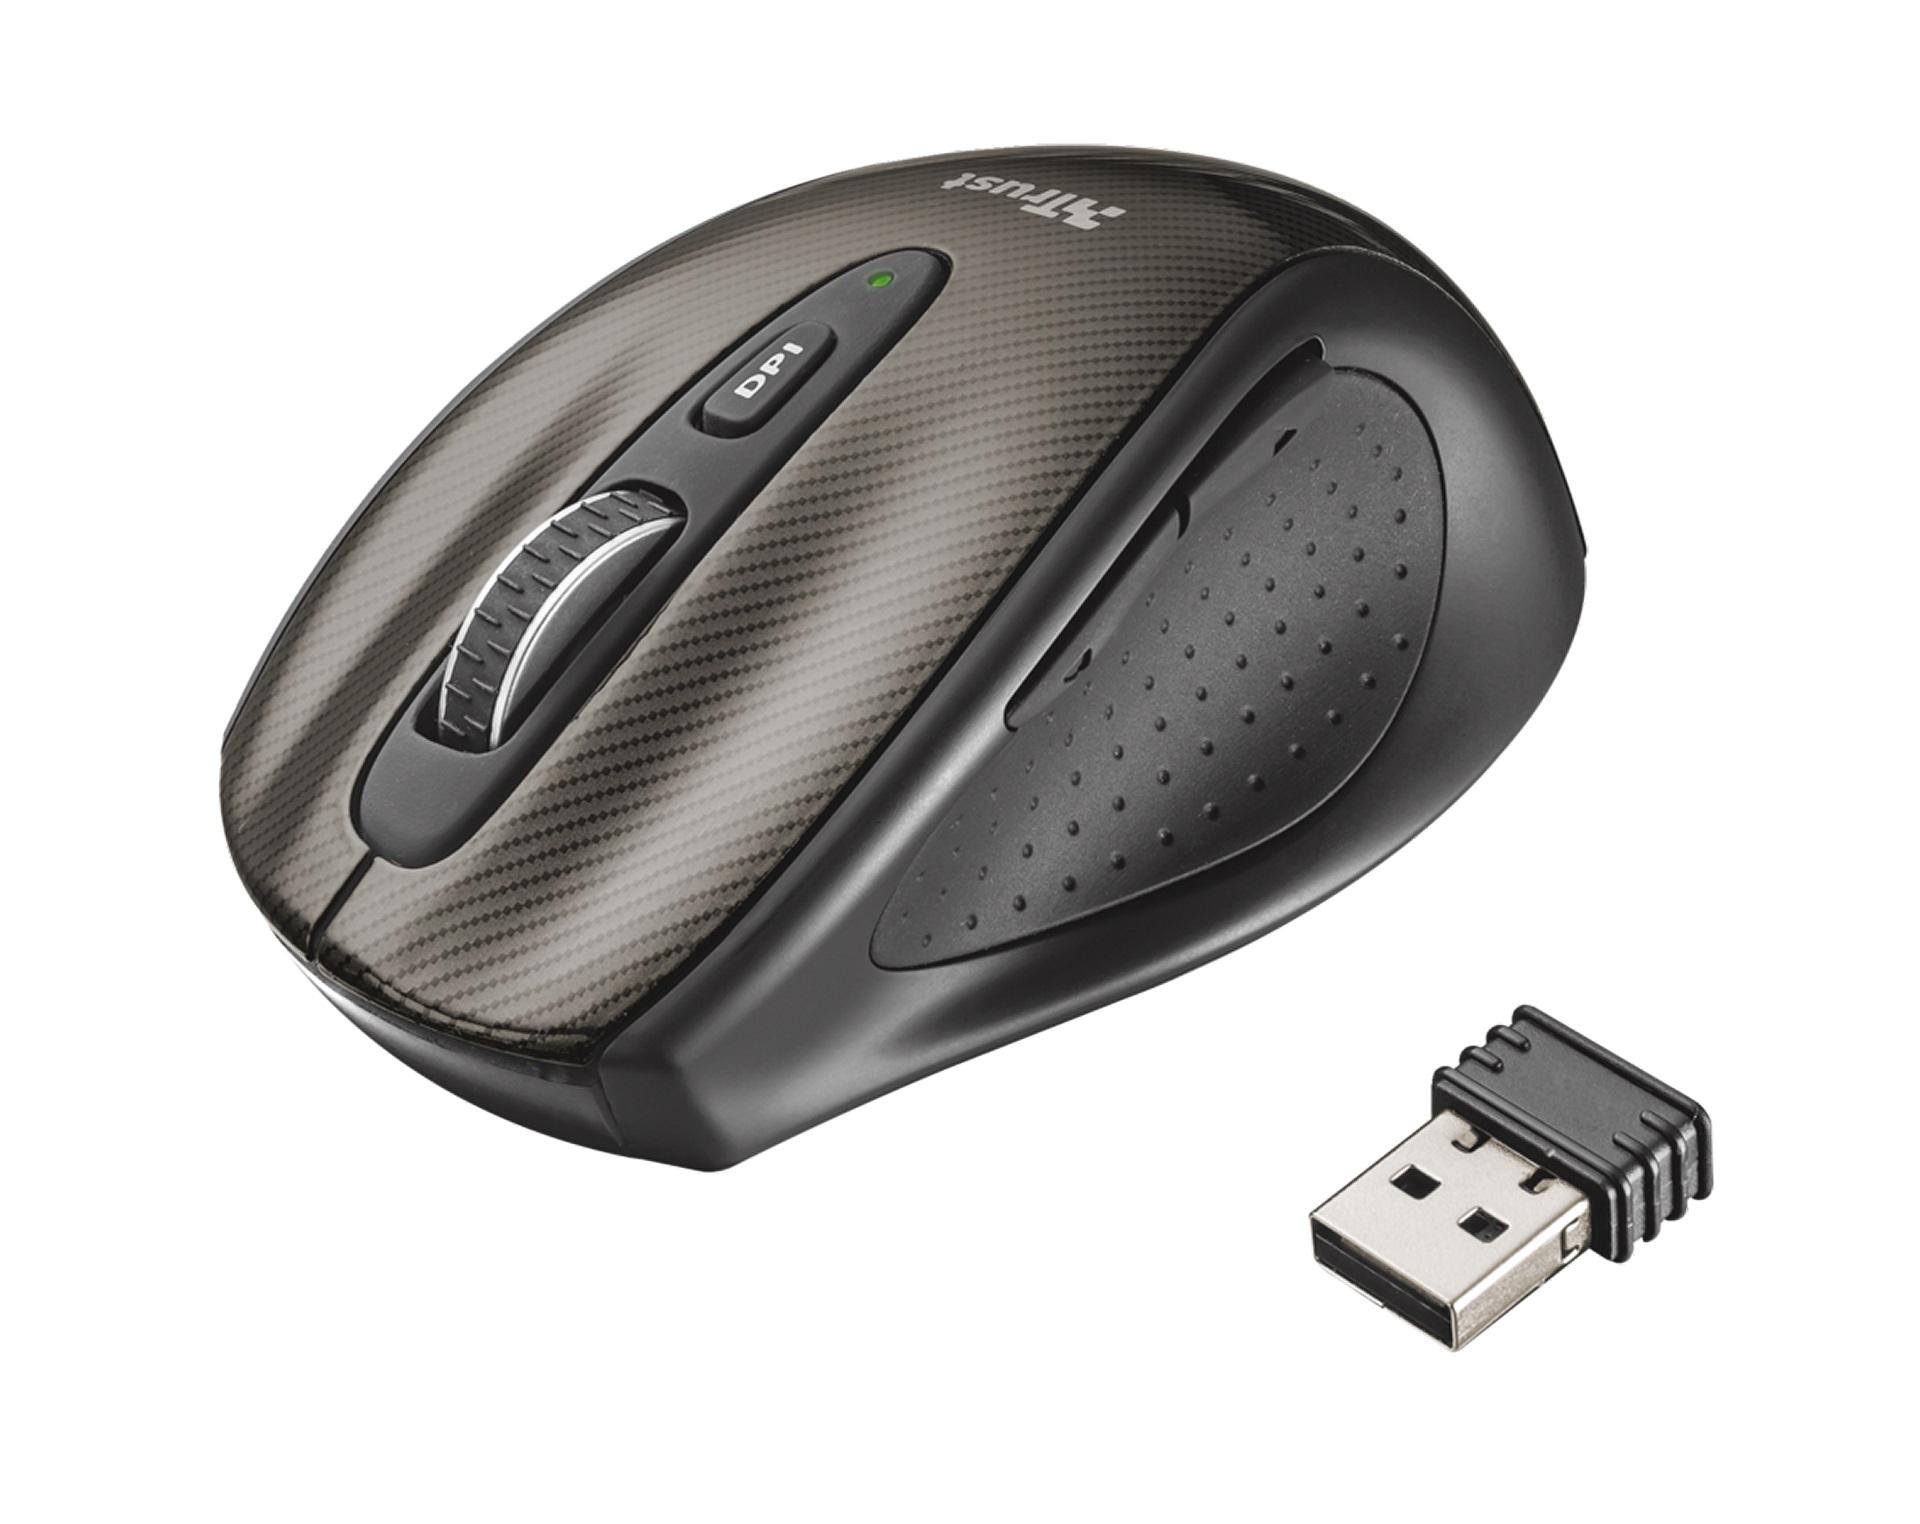 myš TRUST Kerb Compact Wireless Laser Mouse